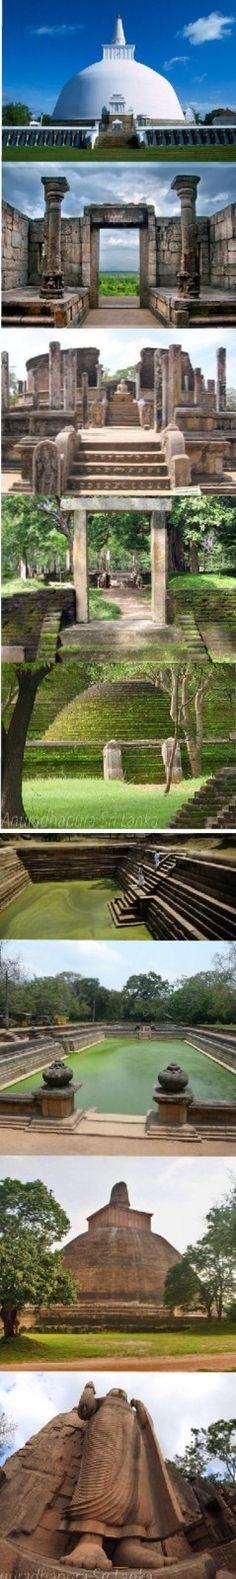 "Anuradhapura became the capital of Sri Lanka in the 4th century BC. Sri Lankan history from the 4th century BC up to 10th century A.D is generally referred as ""Anuradhapura"" period."